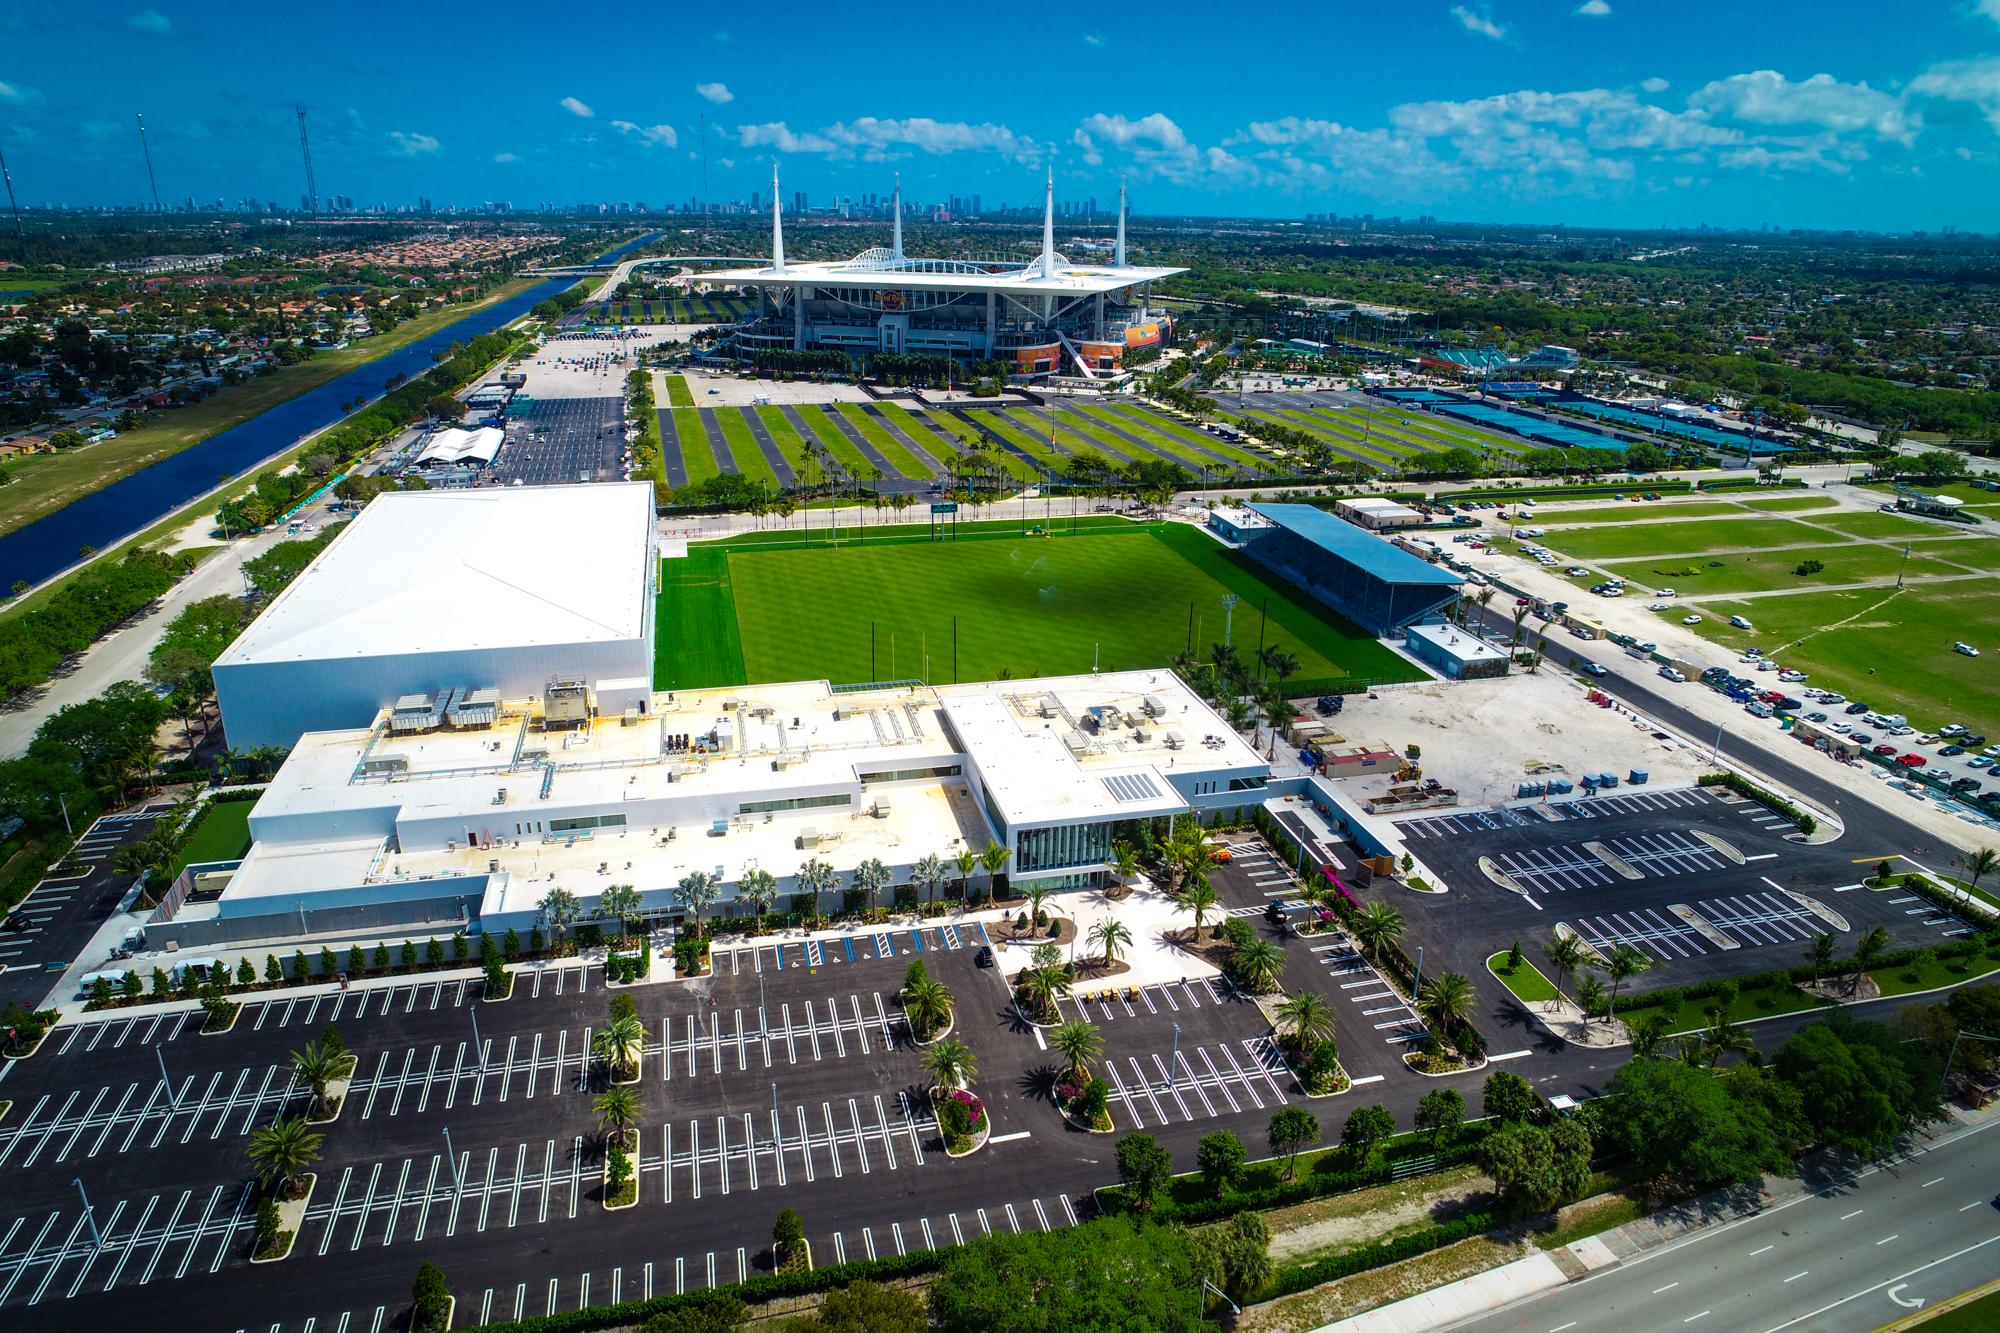 2021-03-12-8679-Miami-Dolphins-Practice-Facility-44.jpg